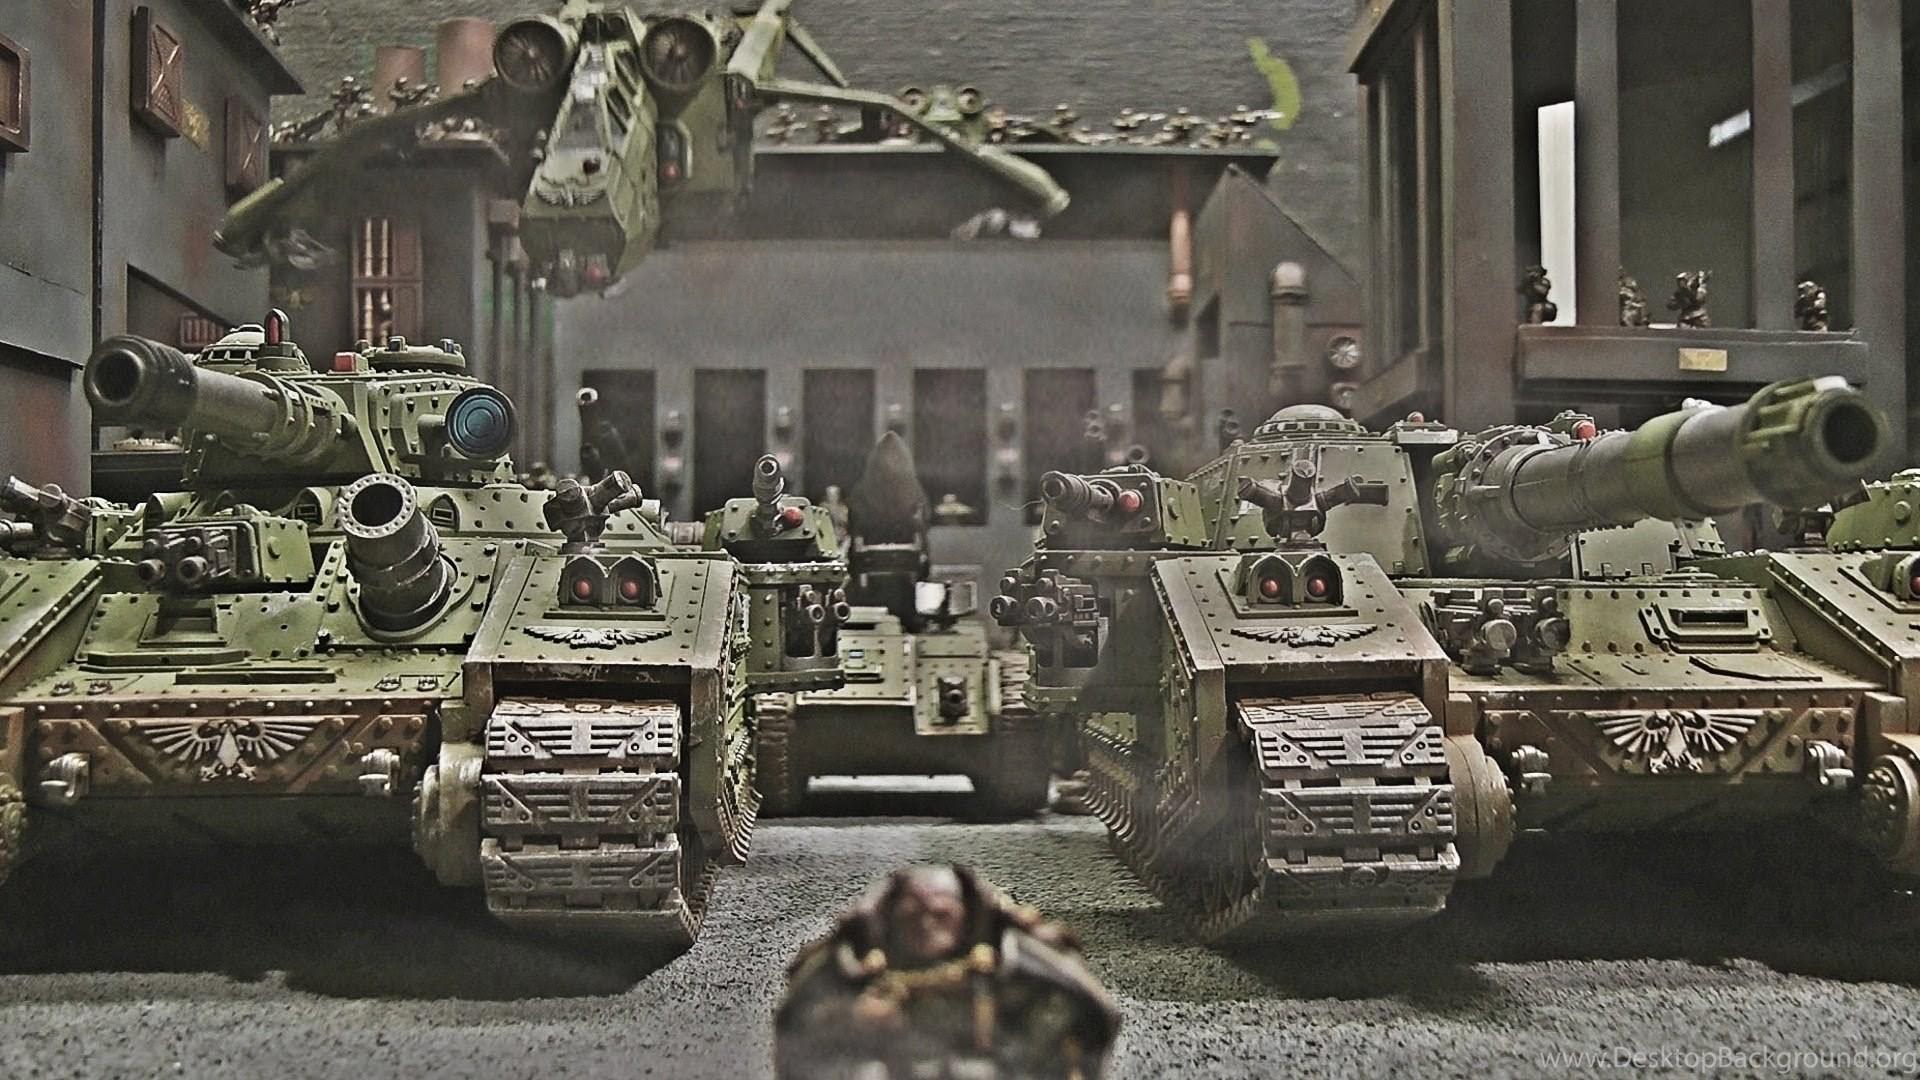 Imperial Guard Marching Warhammer 40k Tribute Youtube Desktop